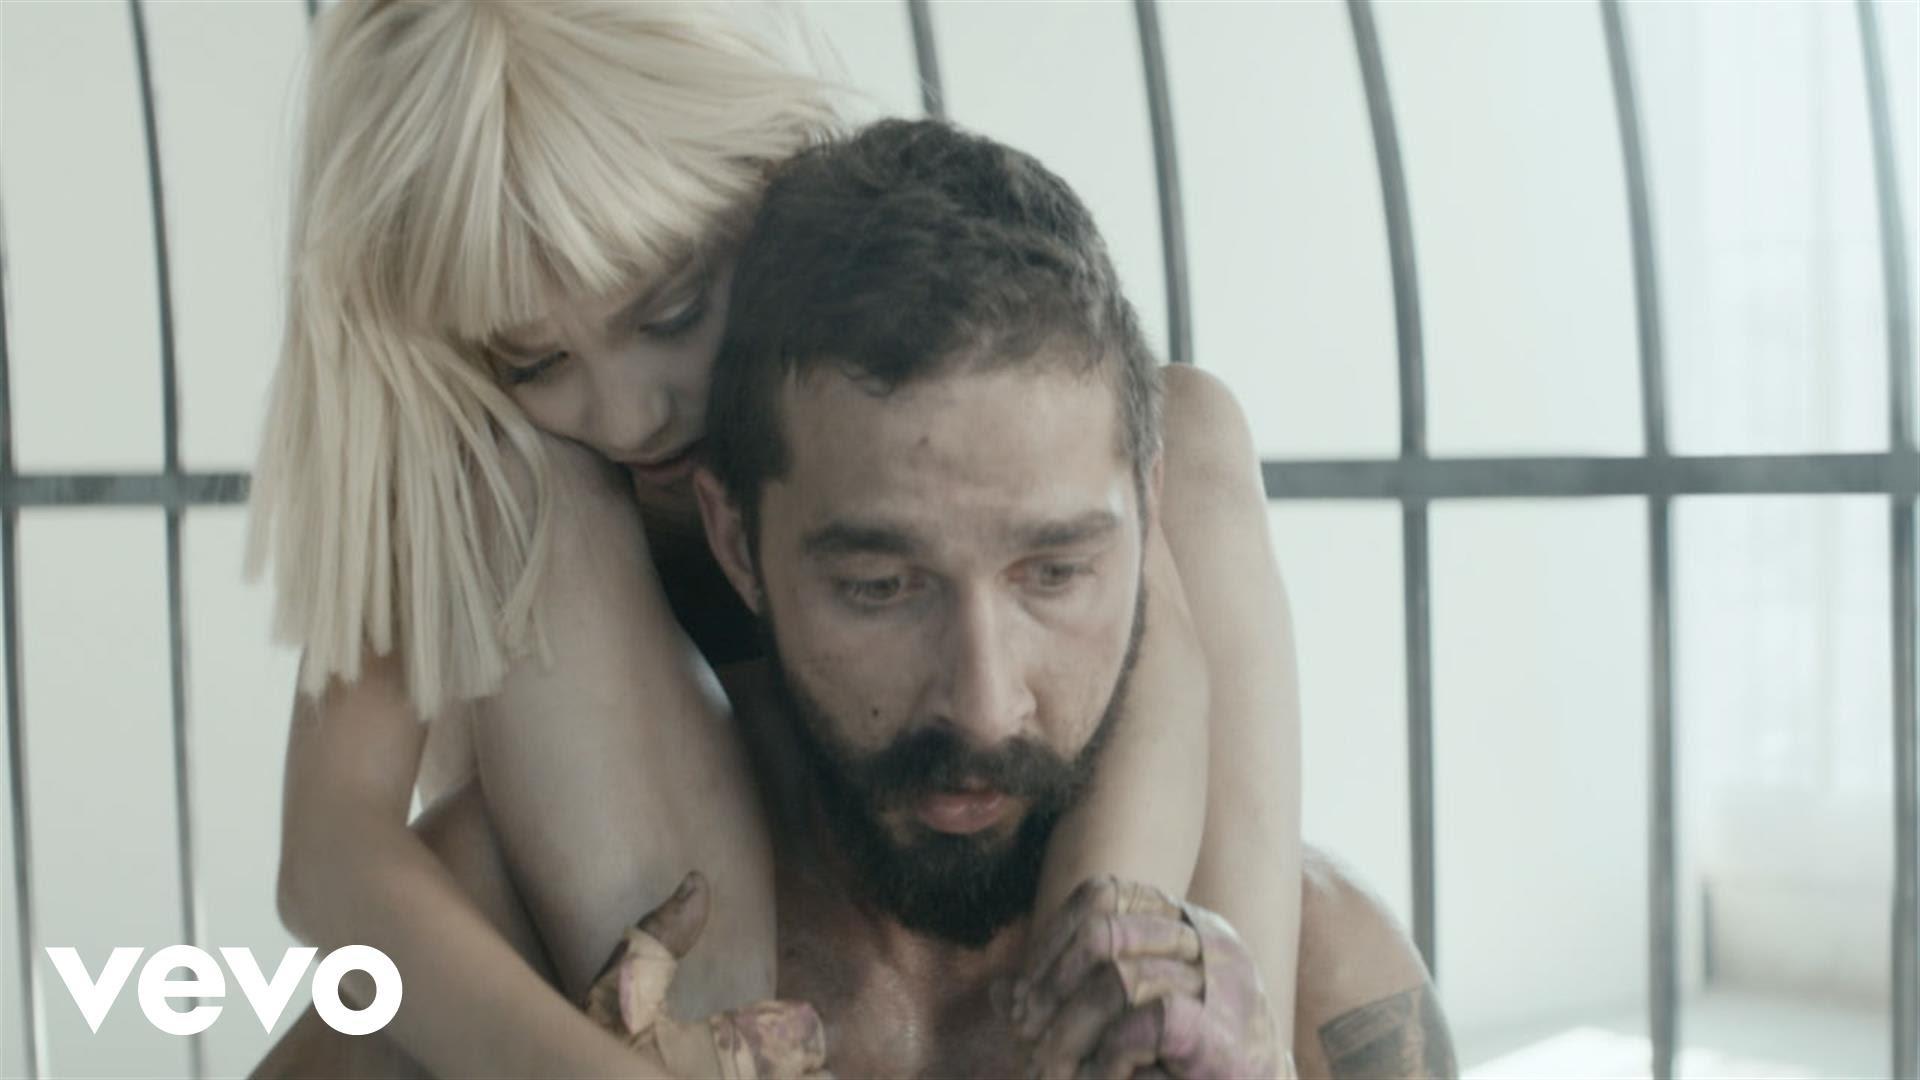 Sia – Elastic Heart feat. Shia LaBeouf & Maddie Ziegler